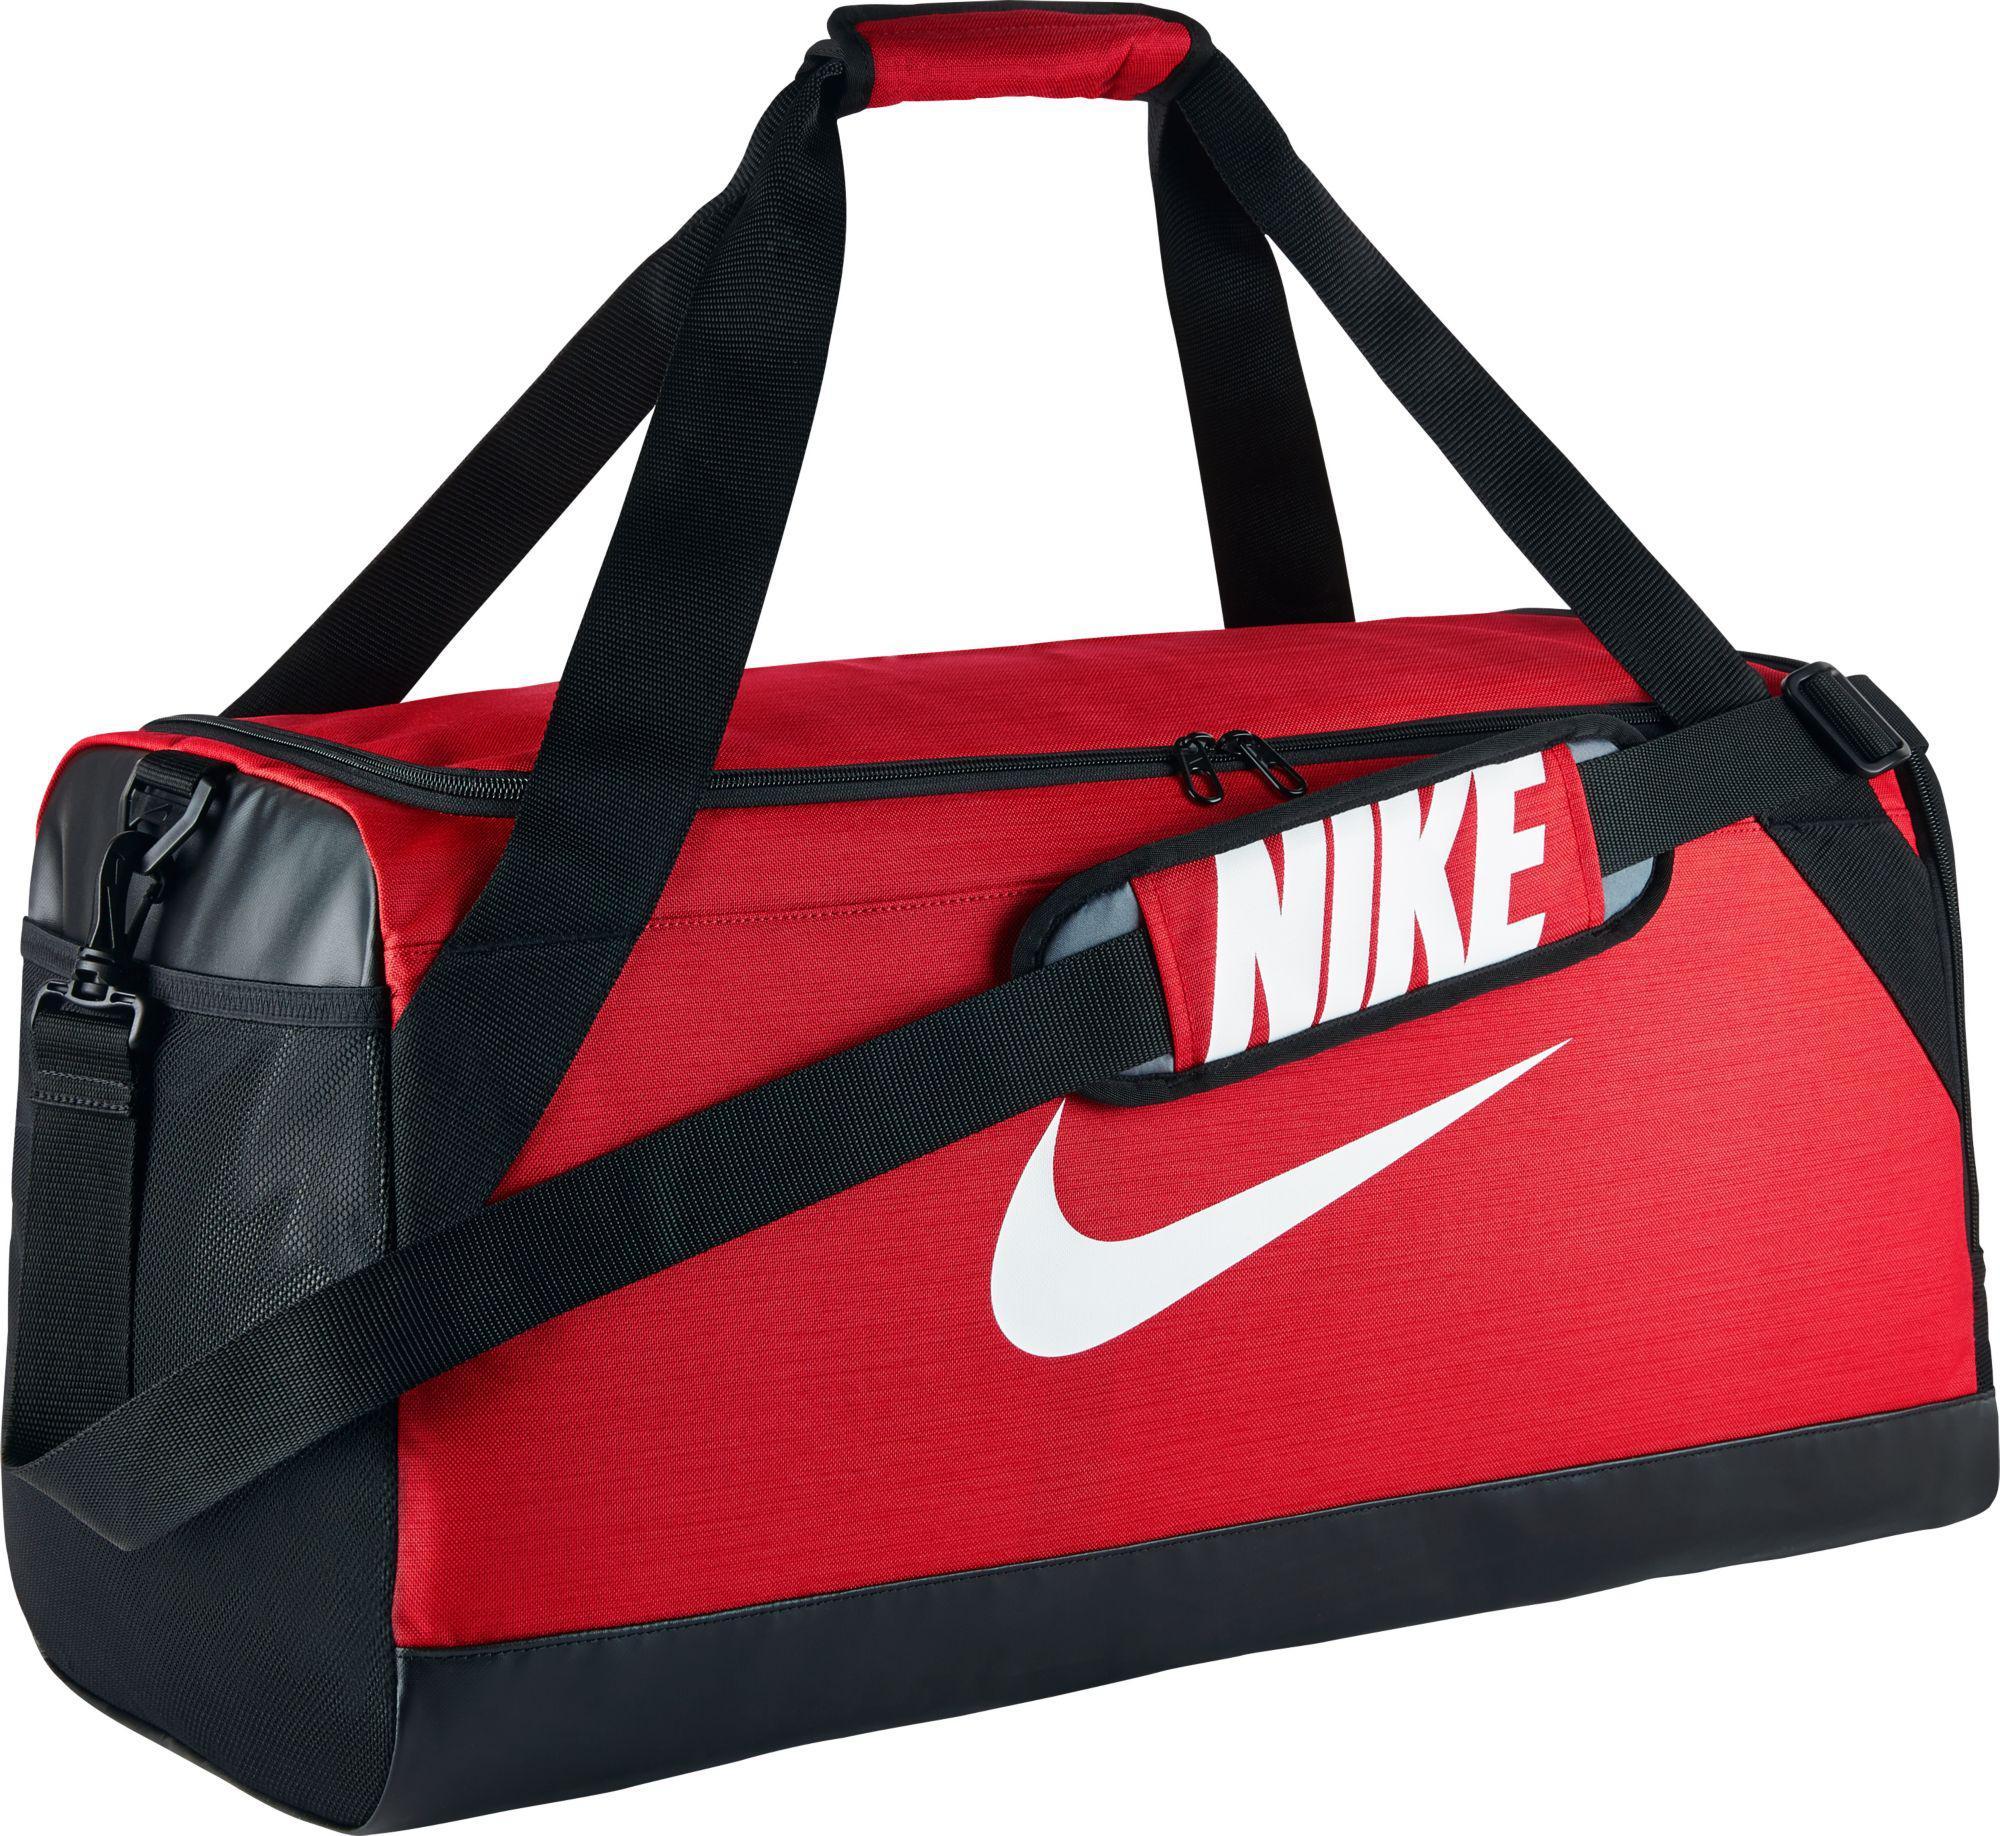 Lyst - Nike Rasilia Medium Training Duffle Bag in Red for Men 2c1d2a3ba0c0d